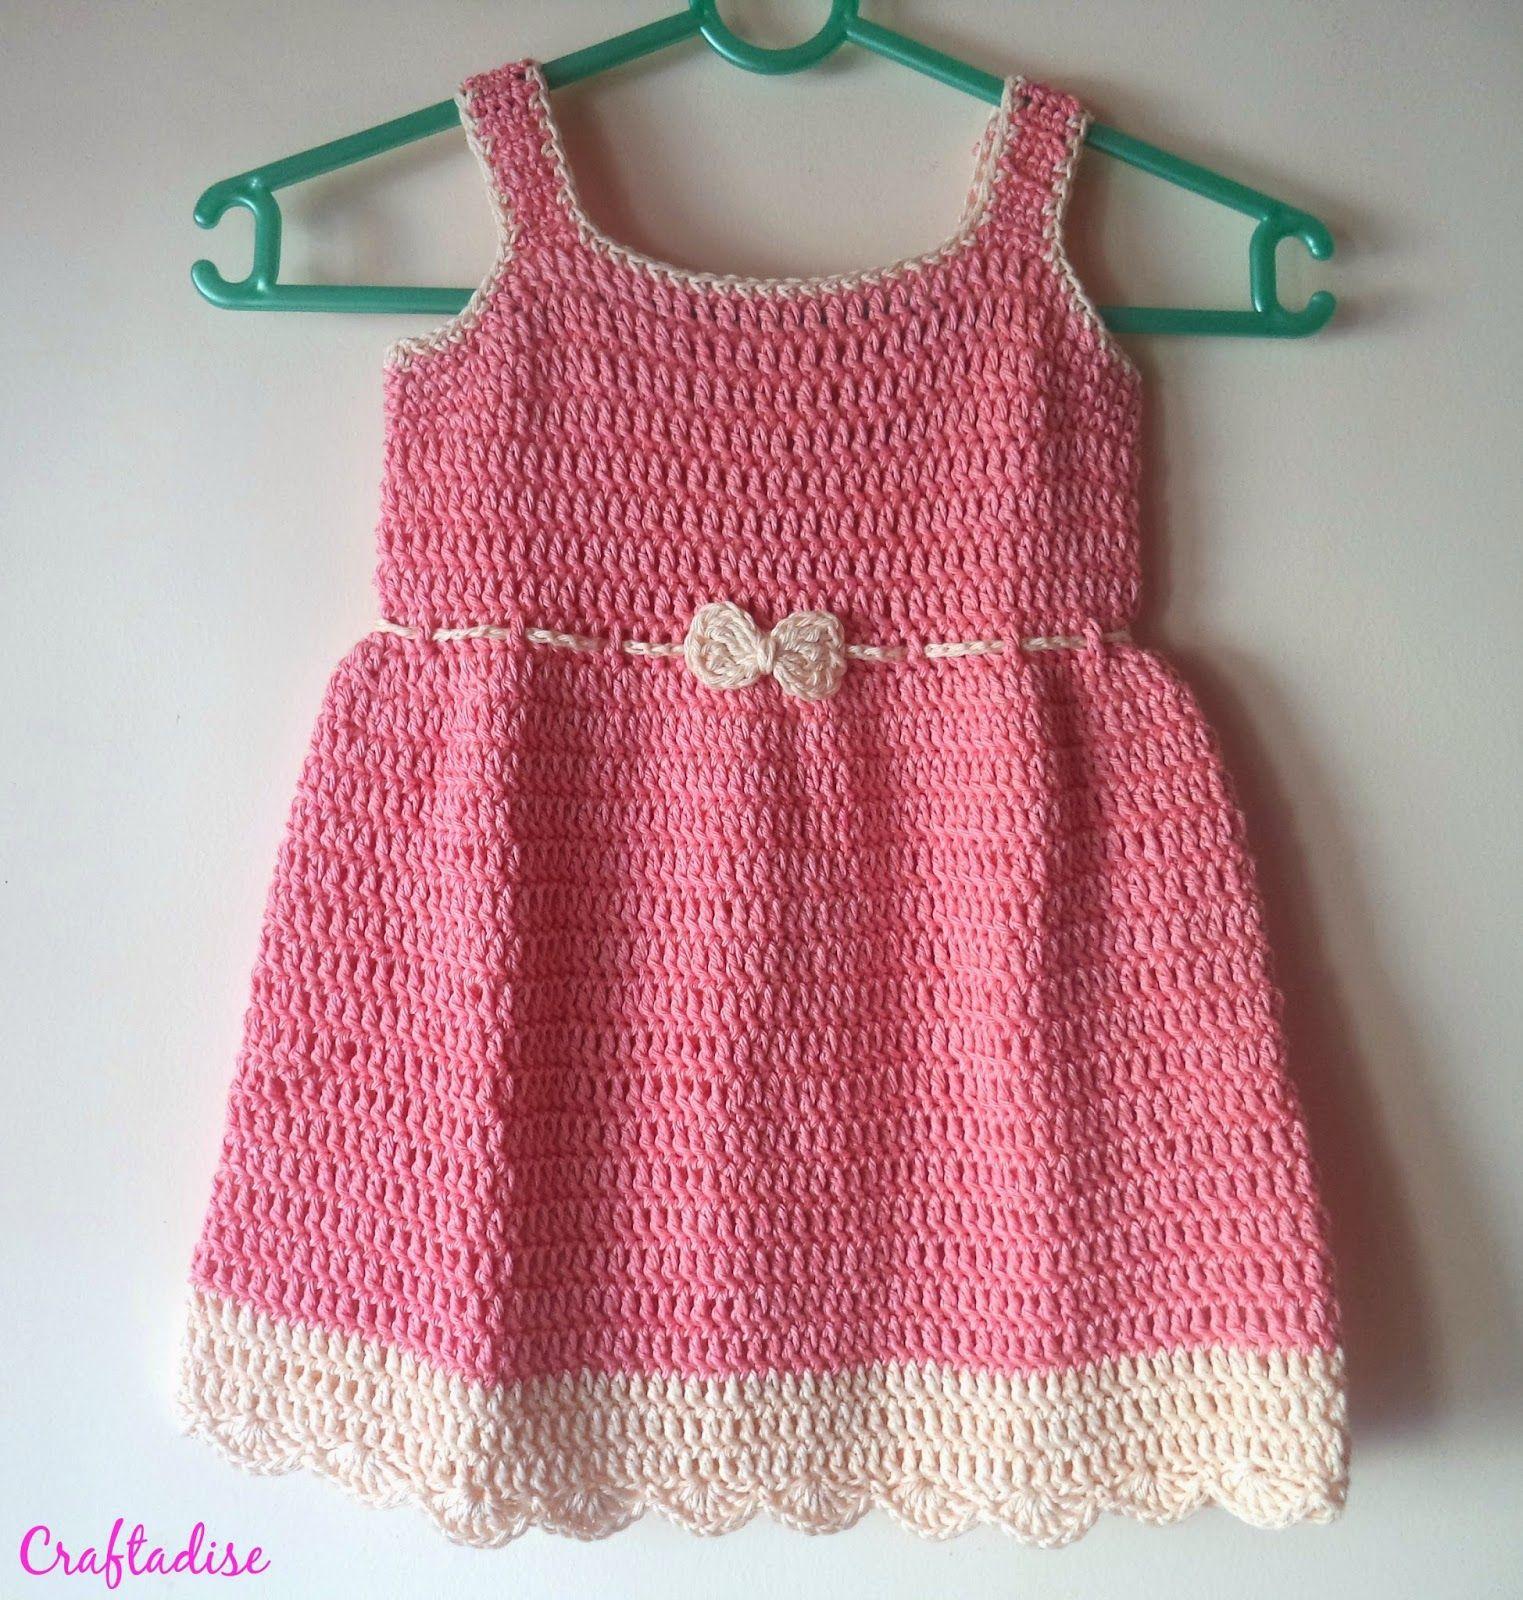 Free crochet pattern crochet summer peach toddler dress my top free crochet pattern crochet summer peach toddler dress bankloansurffo Image collections